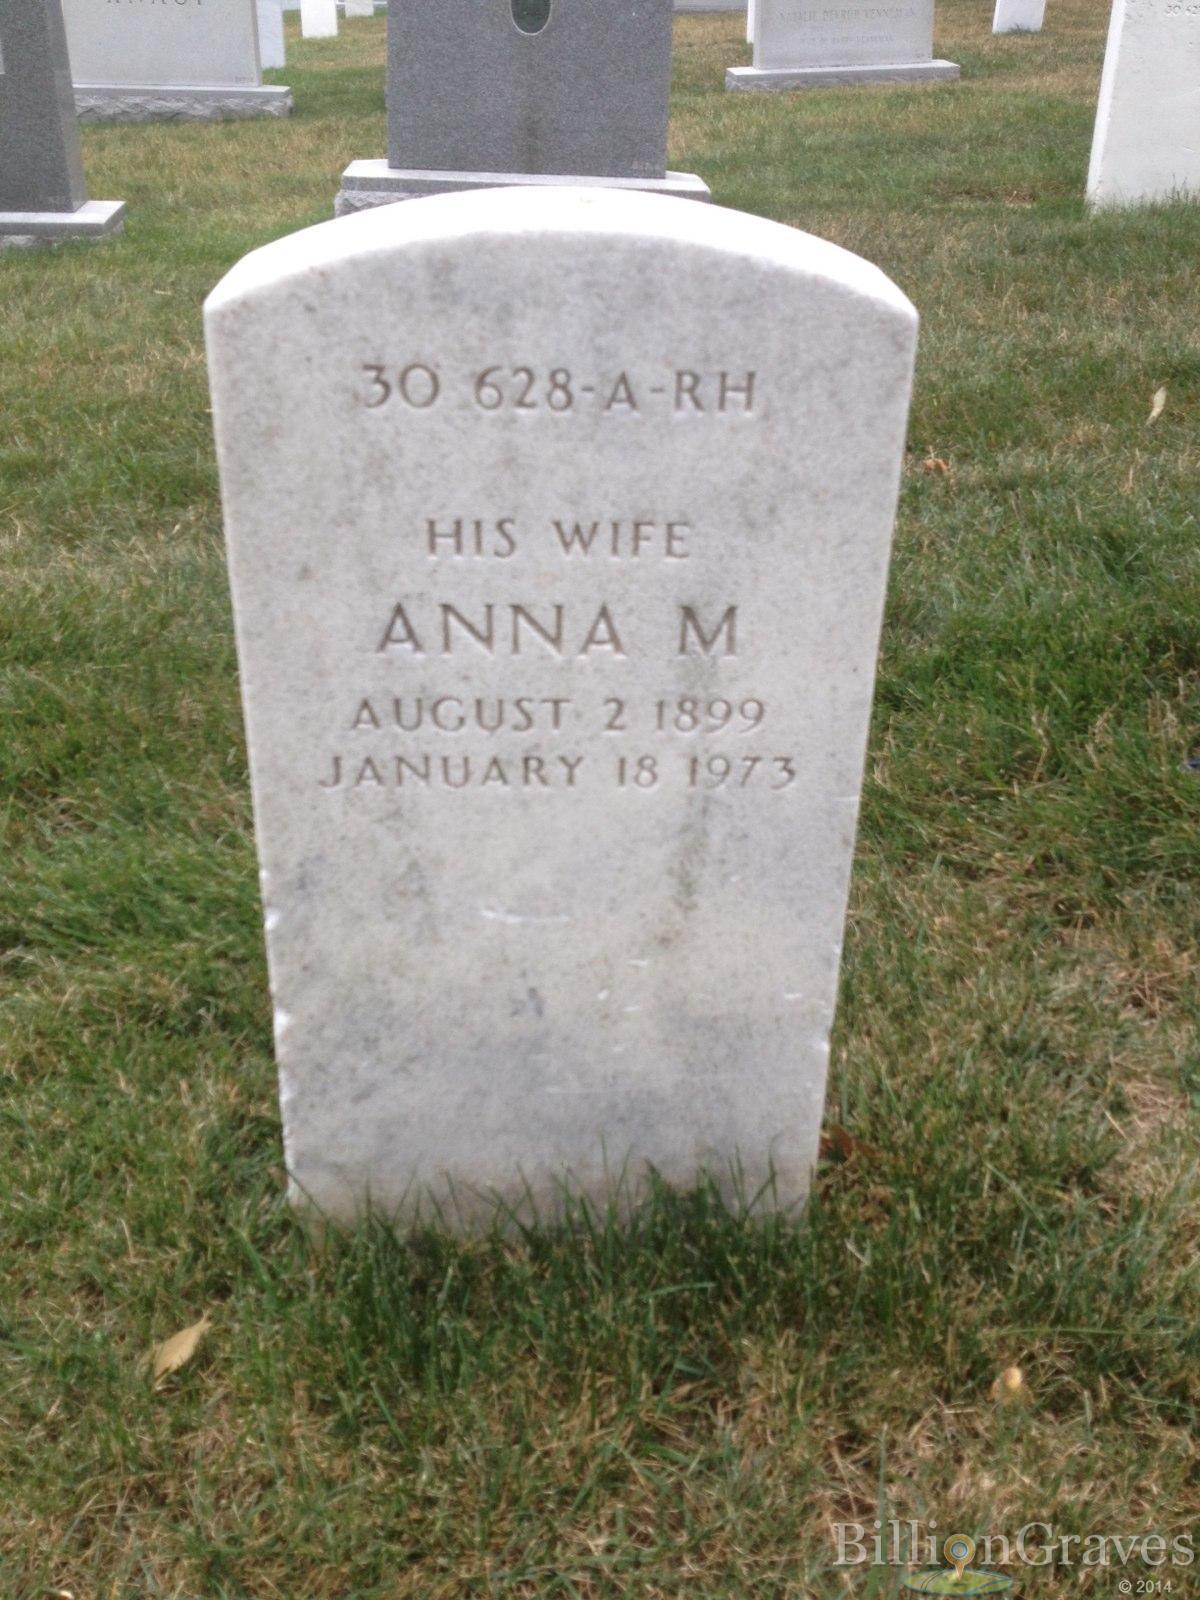 grave site of frank john manno billiongraves headstone image of frank john manno